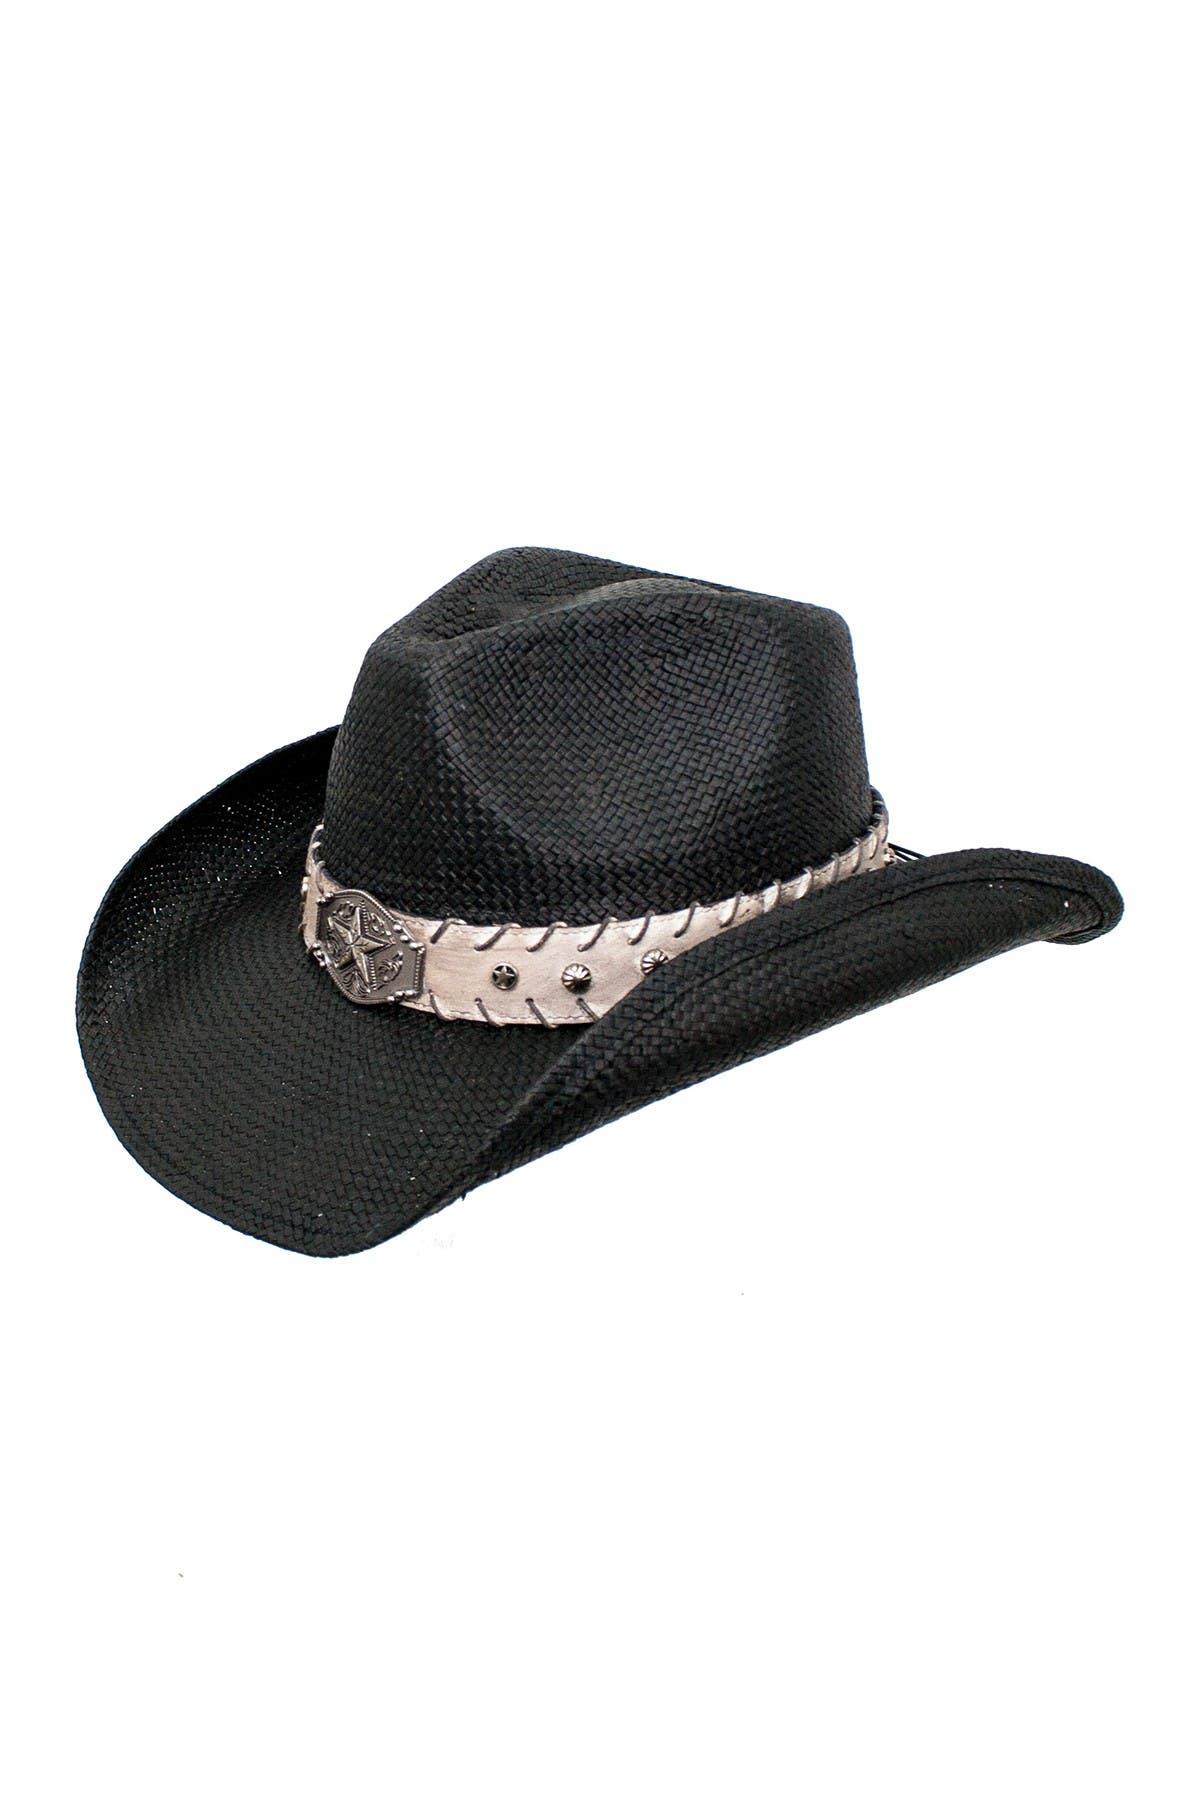 Image of Peter Grimm Headwear Wesley Banded Cowboy Hat